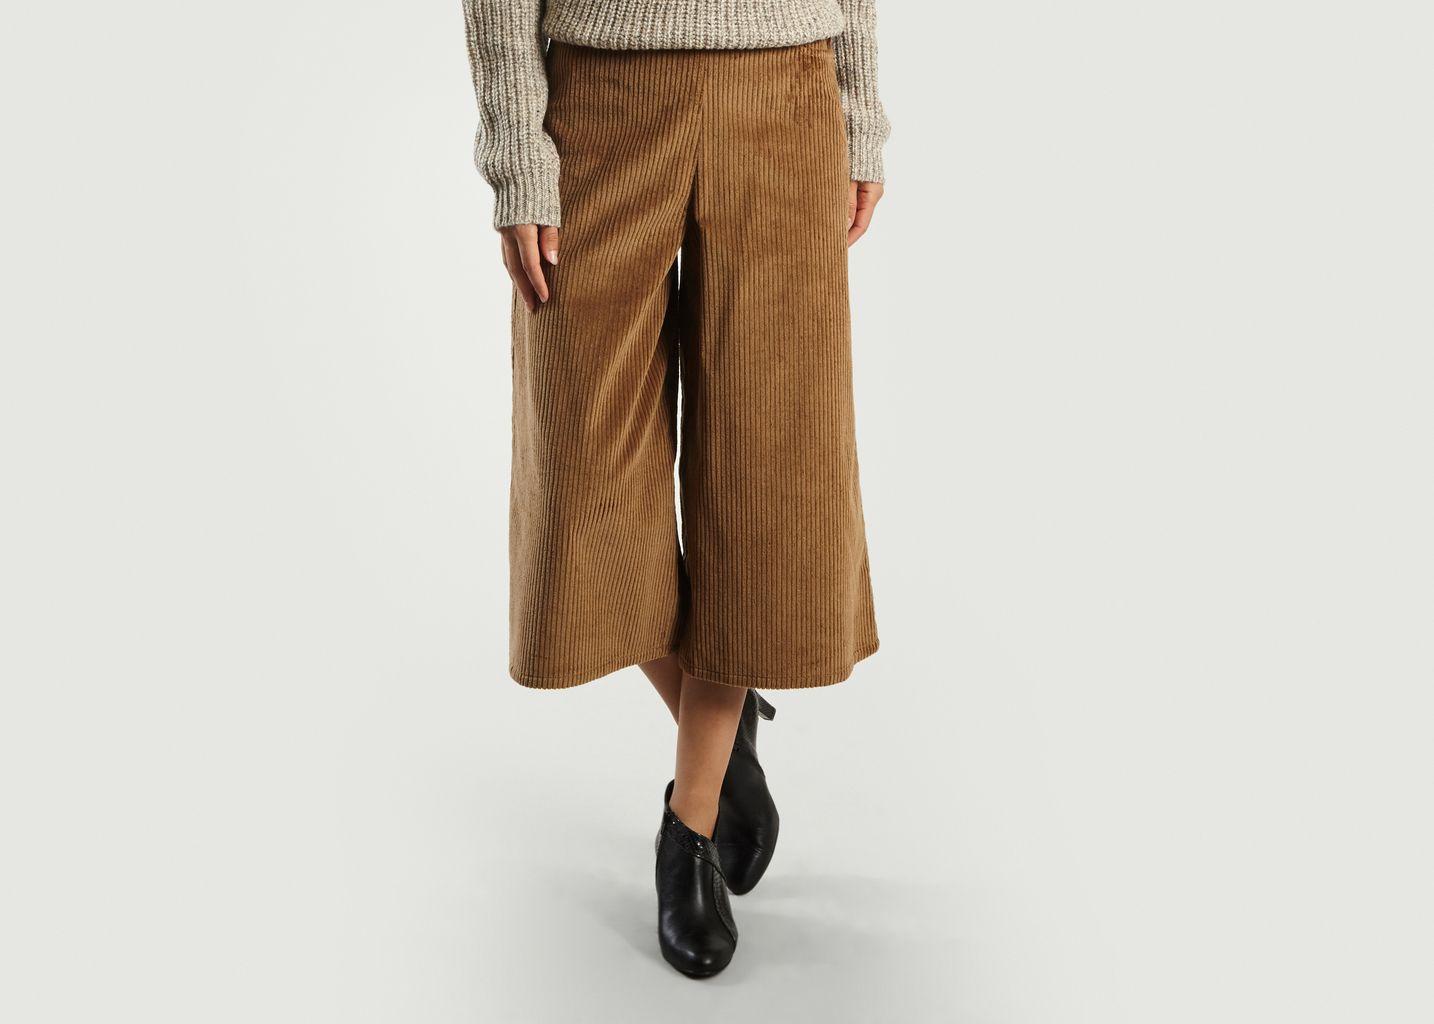 Pantalon en Velours Côtelé - See by Chloé